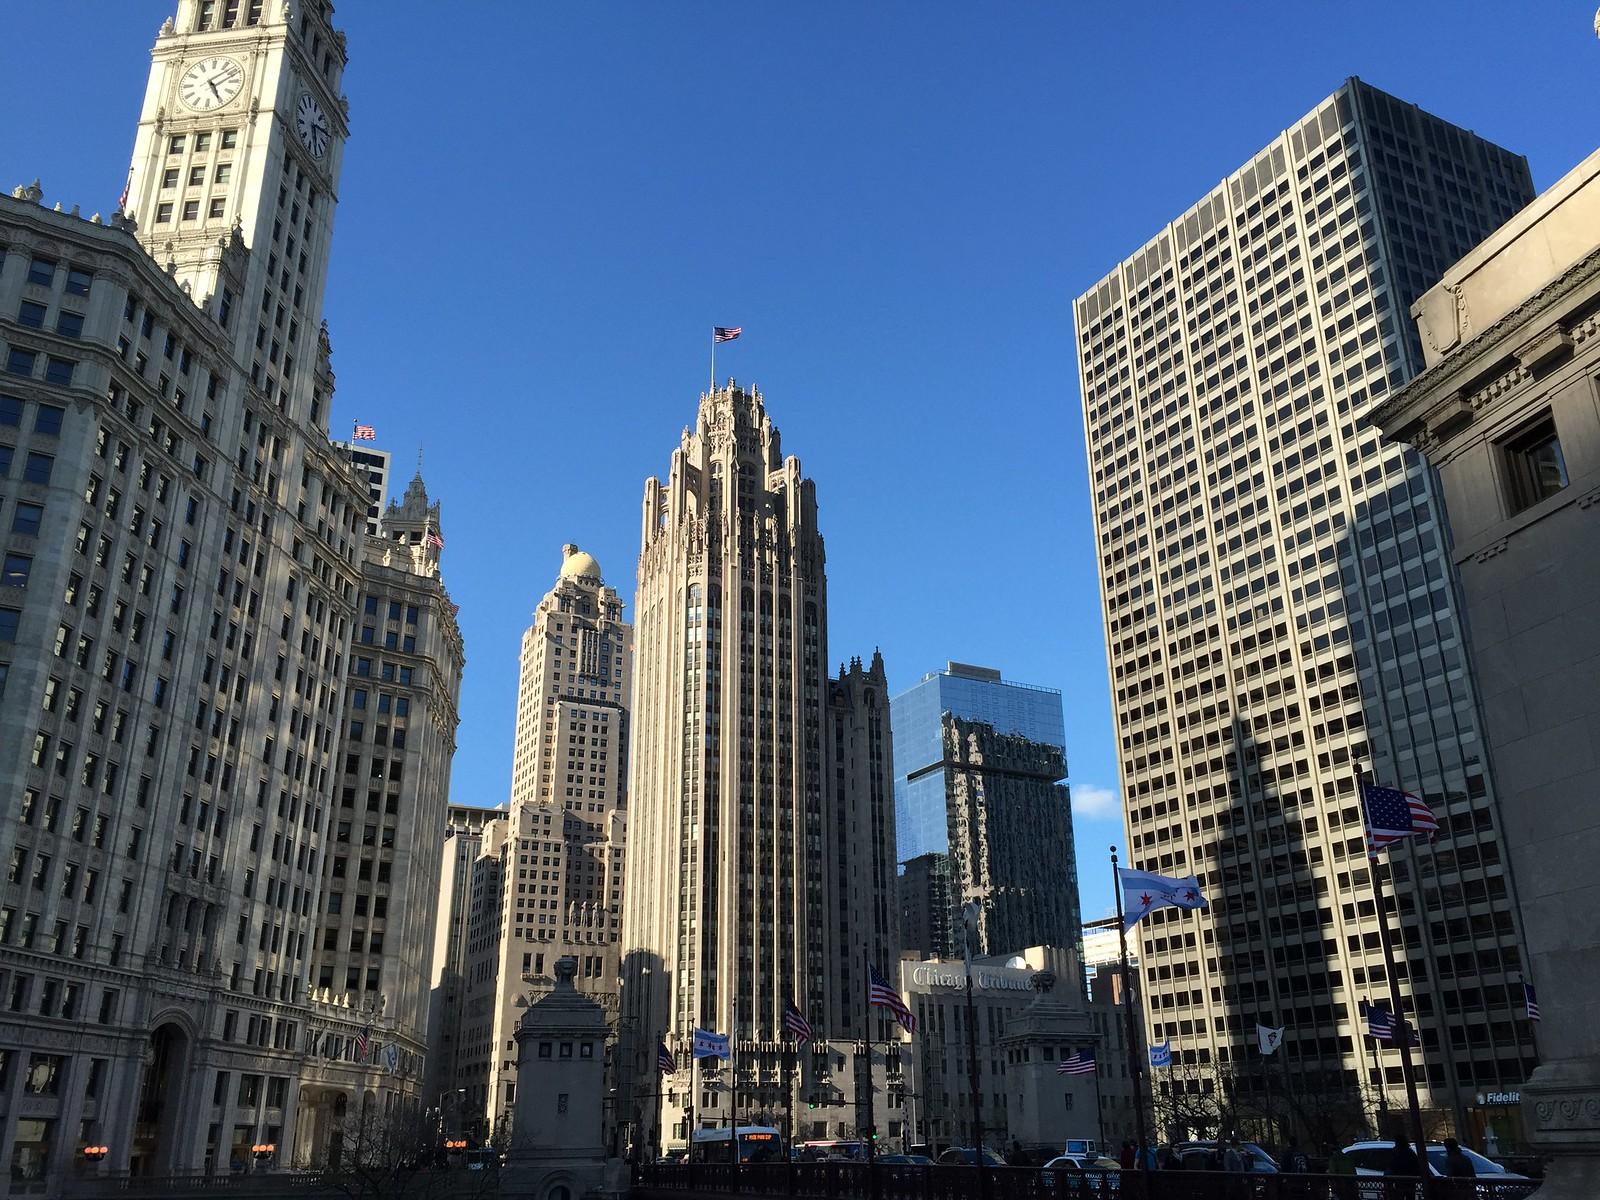 Chicago 21-04-2015 17-12-08